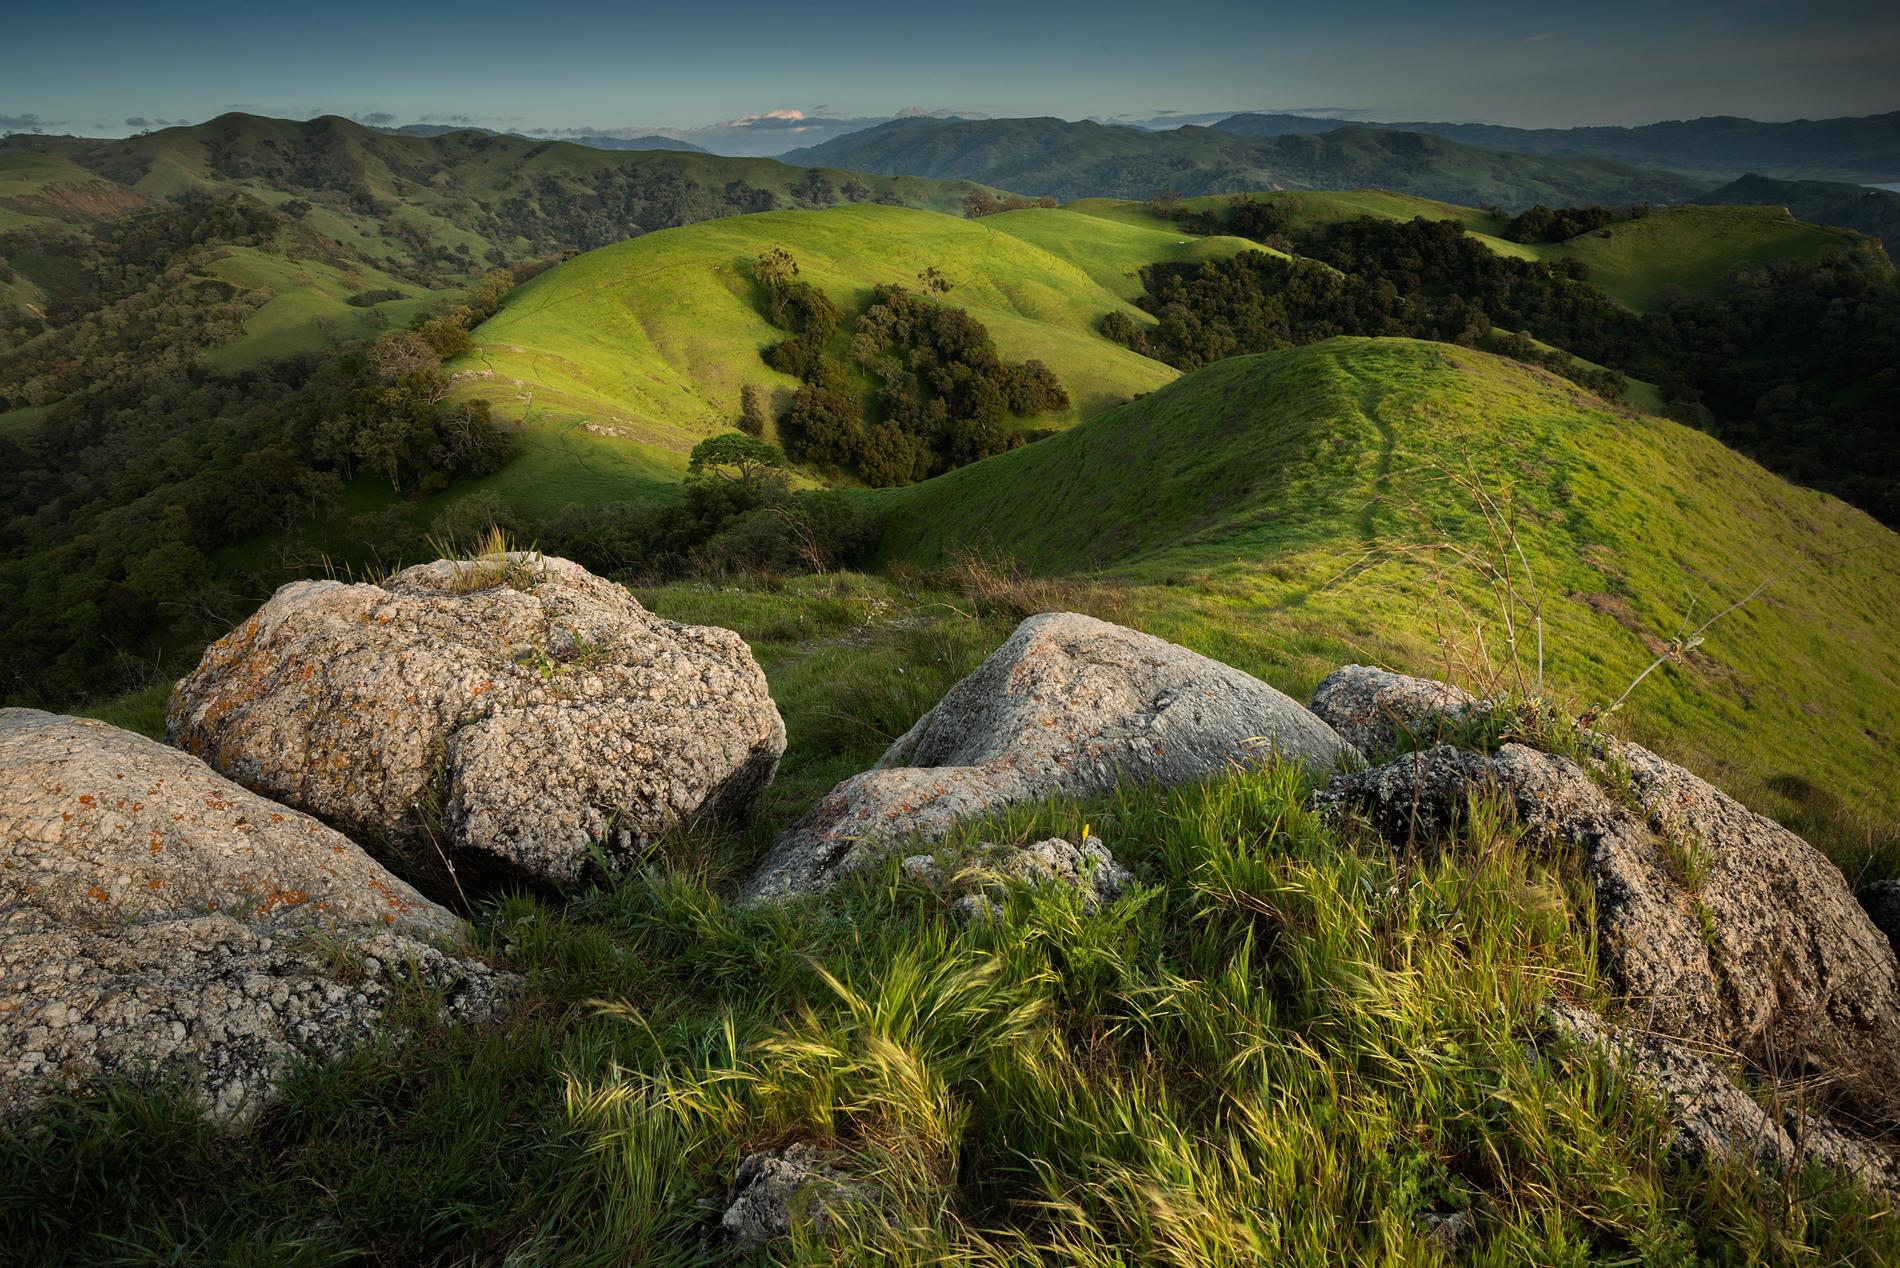 sunol wilderness regionalpreserve green spring nature eastbay park landscape hills California